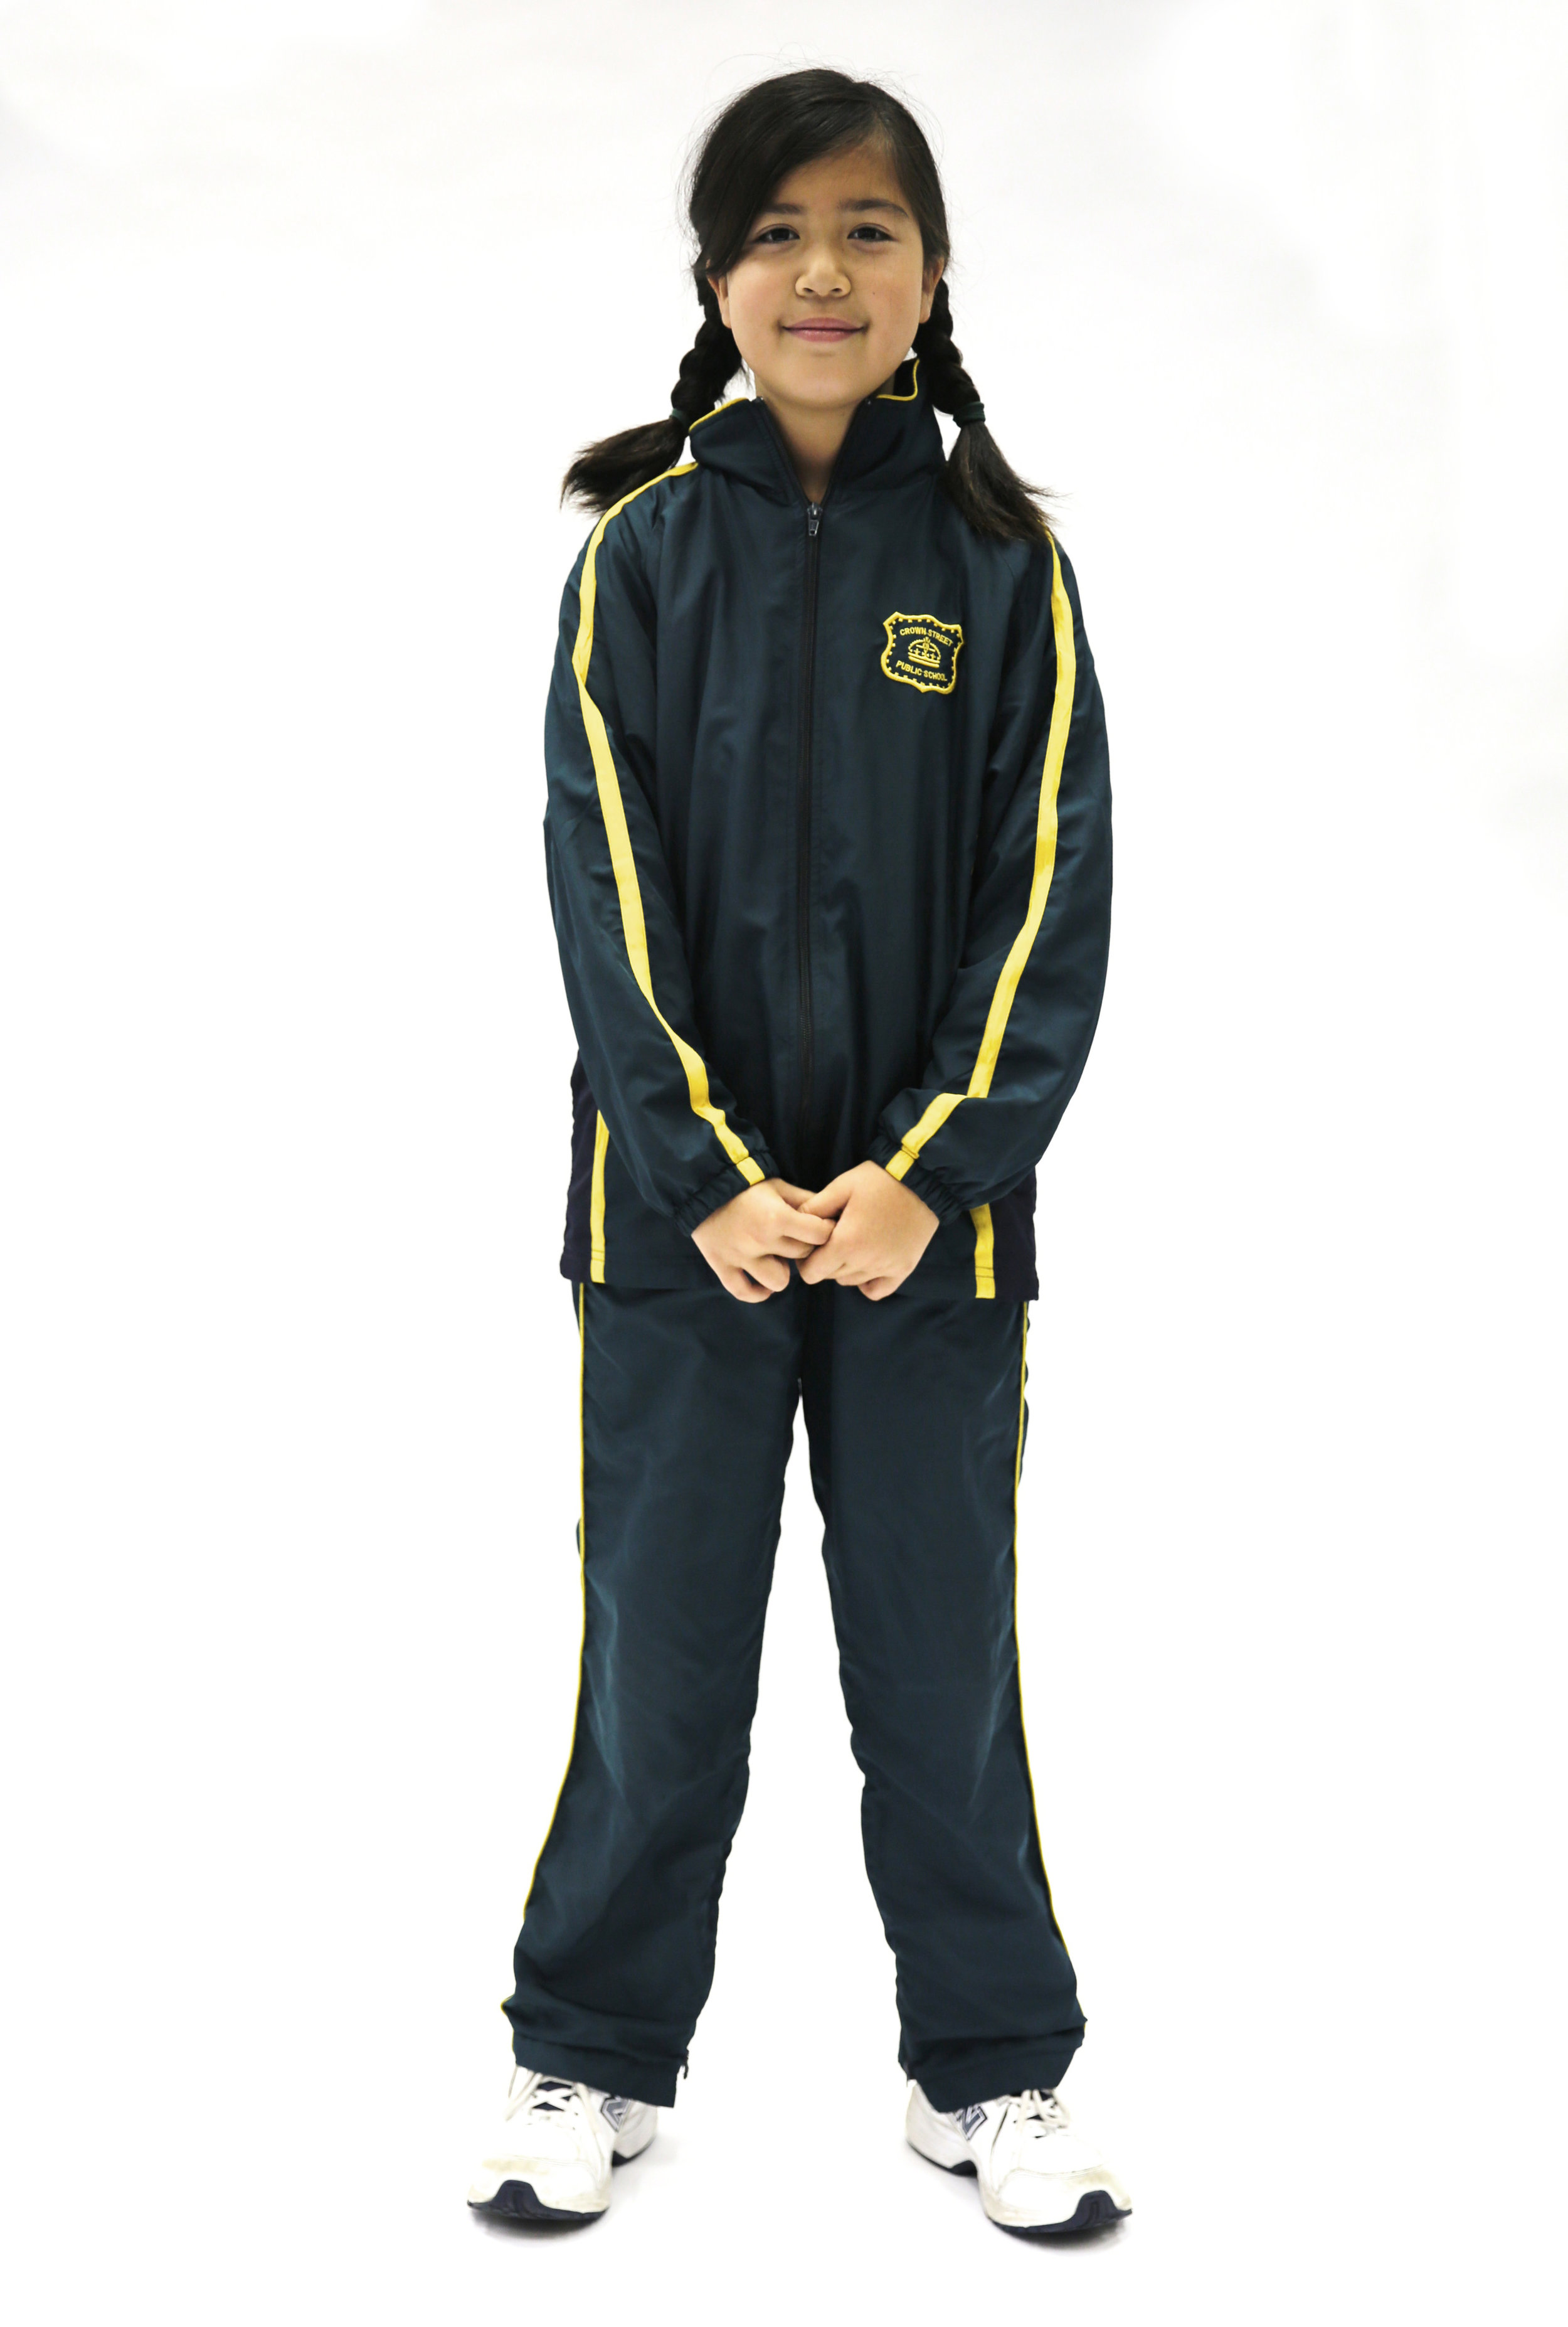 Sports pants, sports jacket - unisex